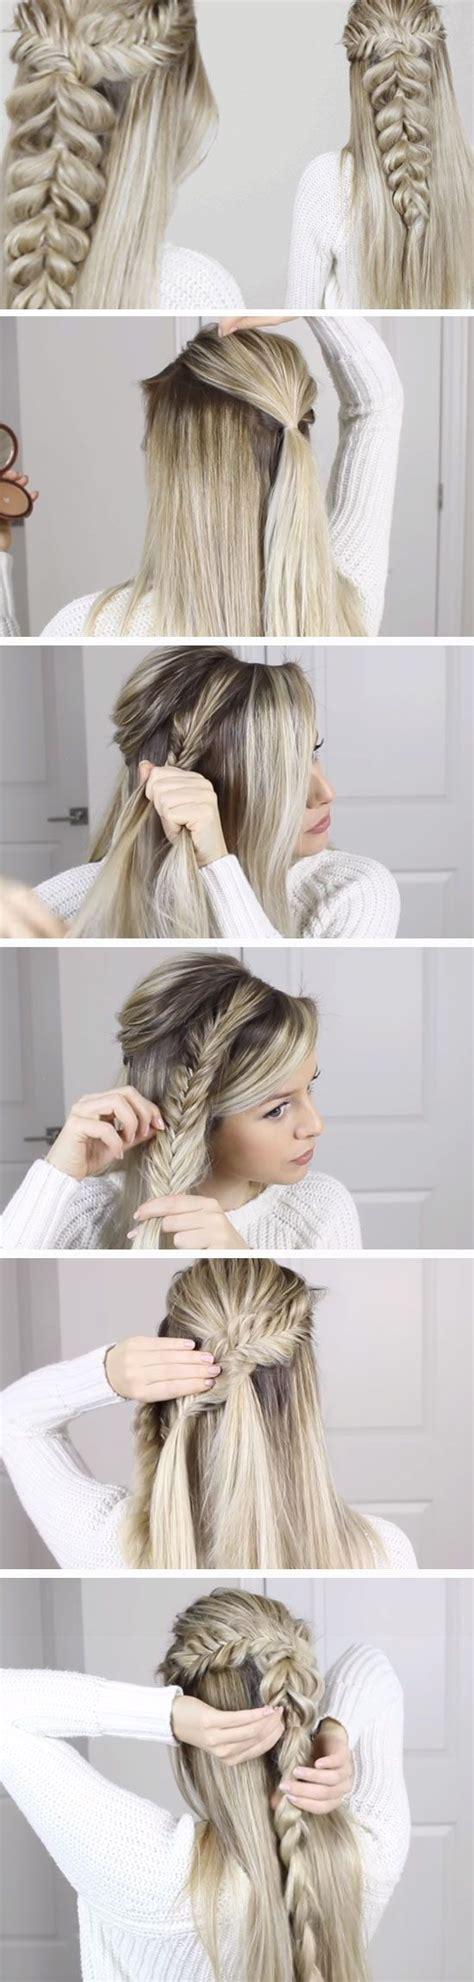 diy wedding hairstyles for medium hair fishtail into pull through braid diy wedding hairstyles for medium hair easy 99haircuts